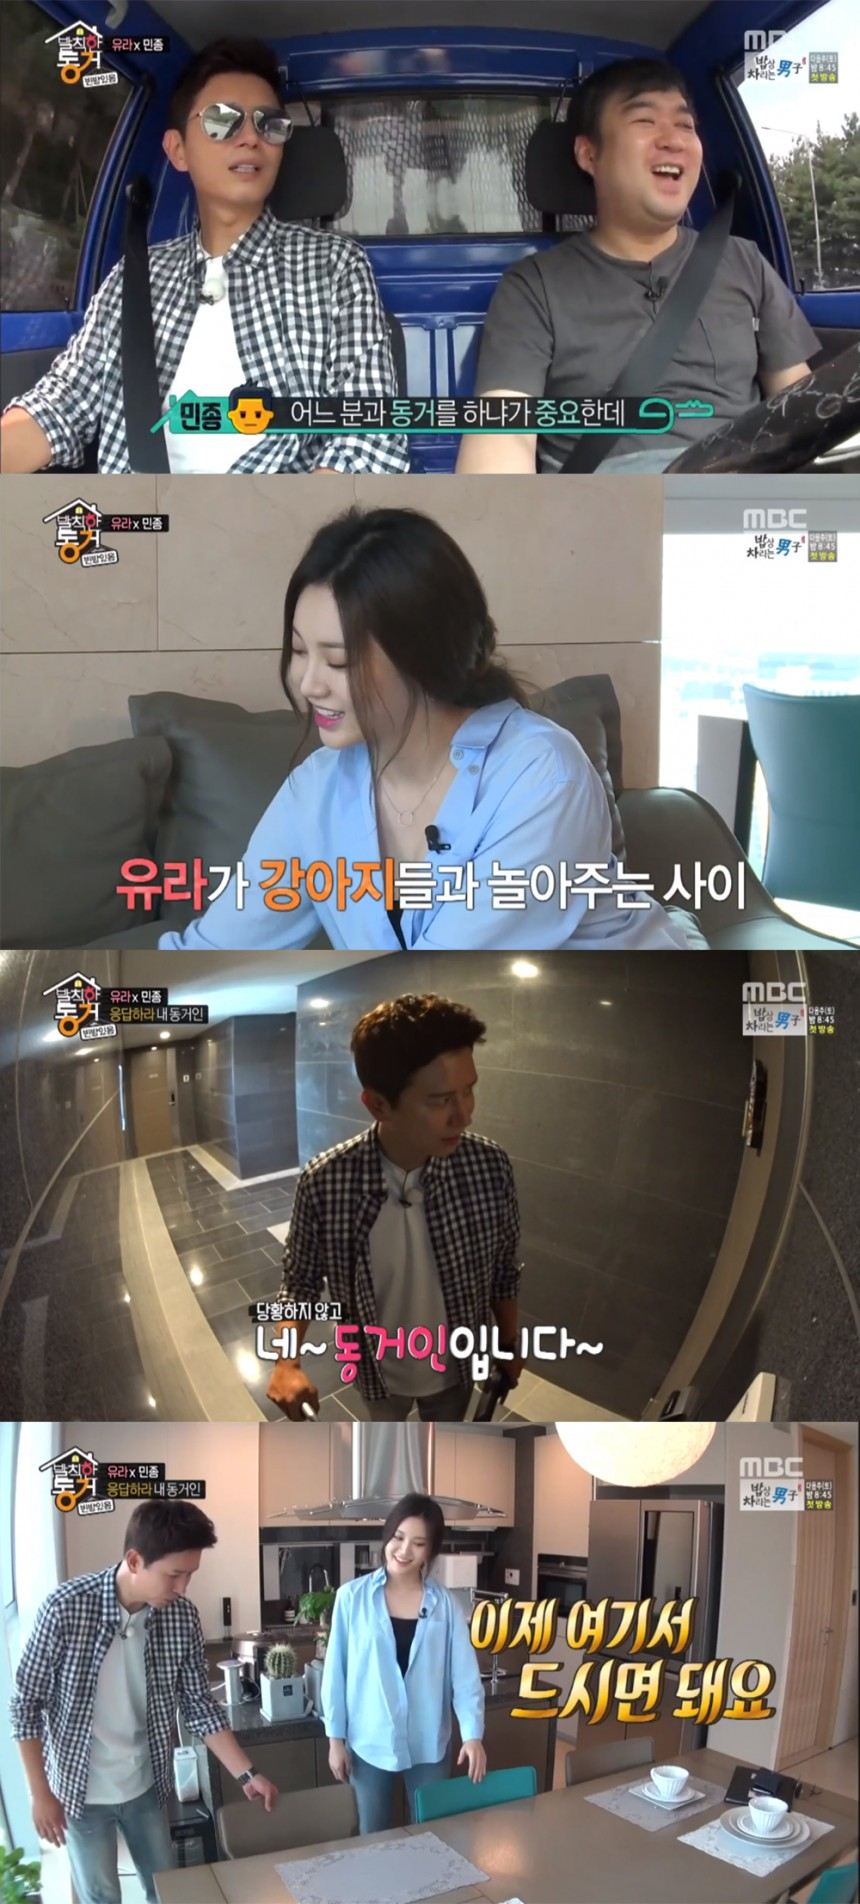 MBC '발칙한 동거 빈방 있음' 방송화면 캡처